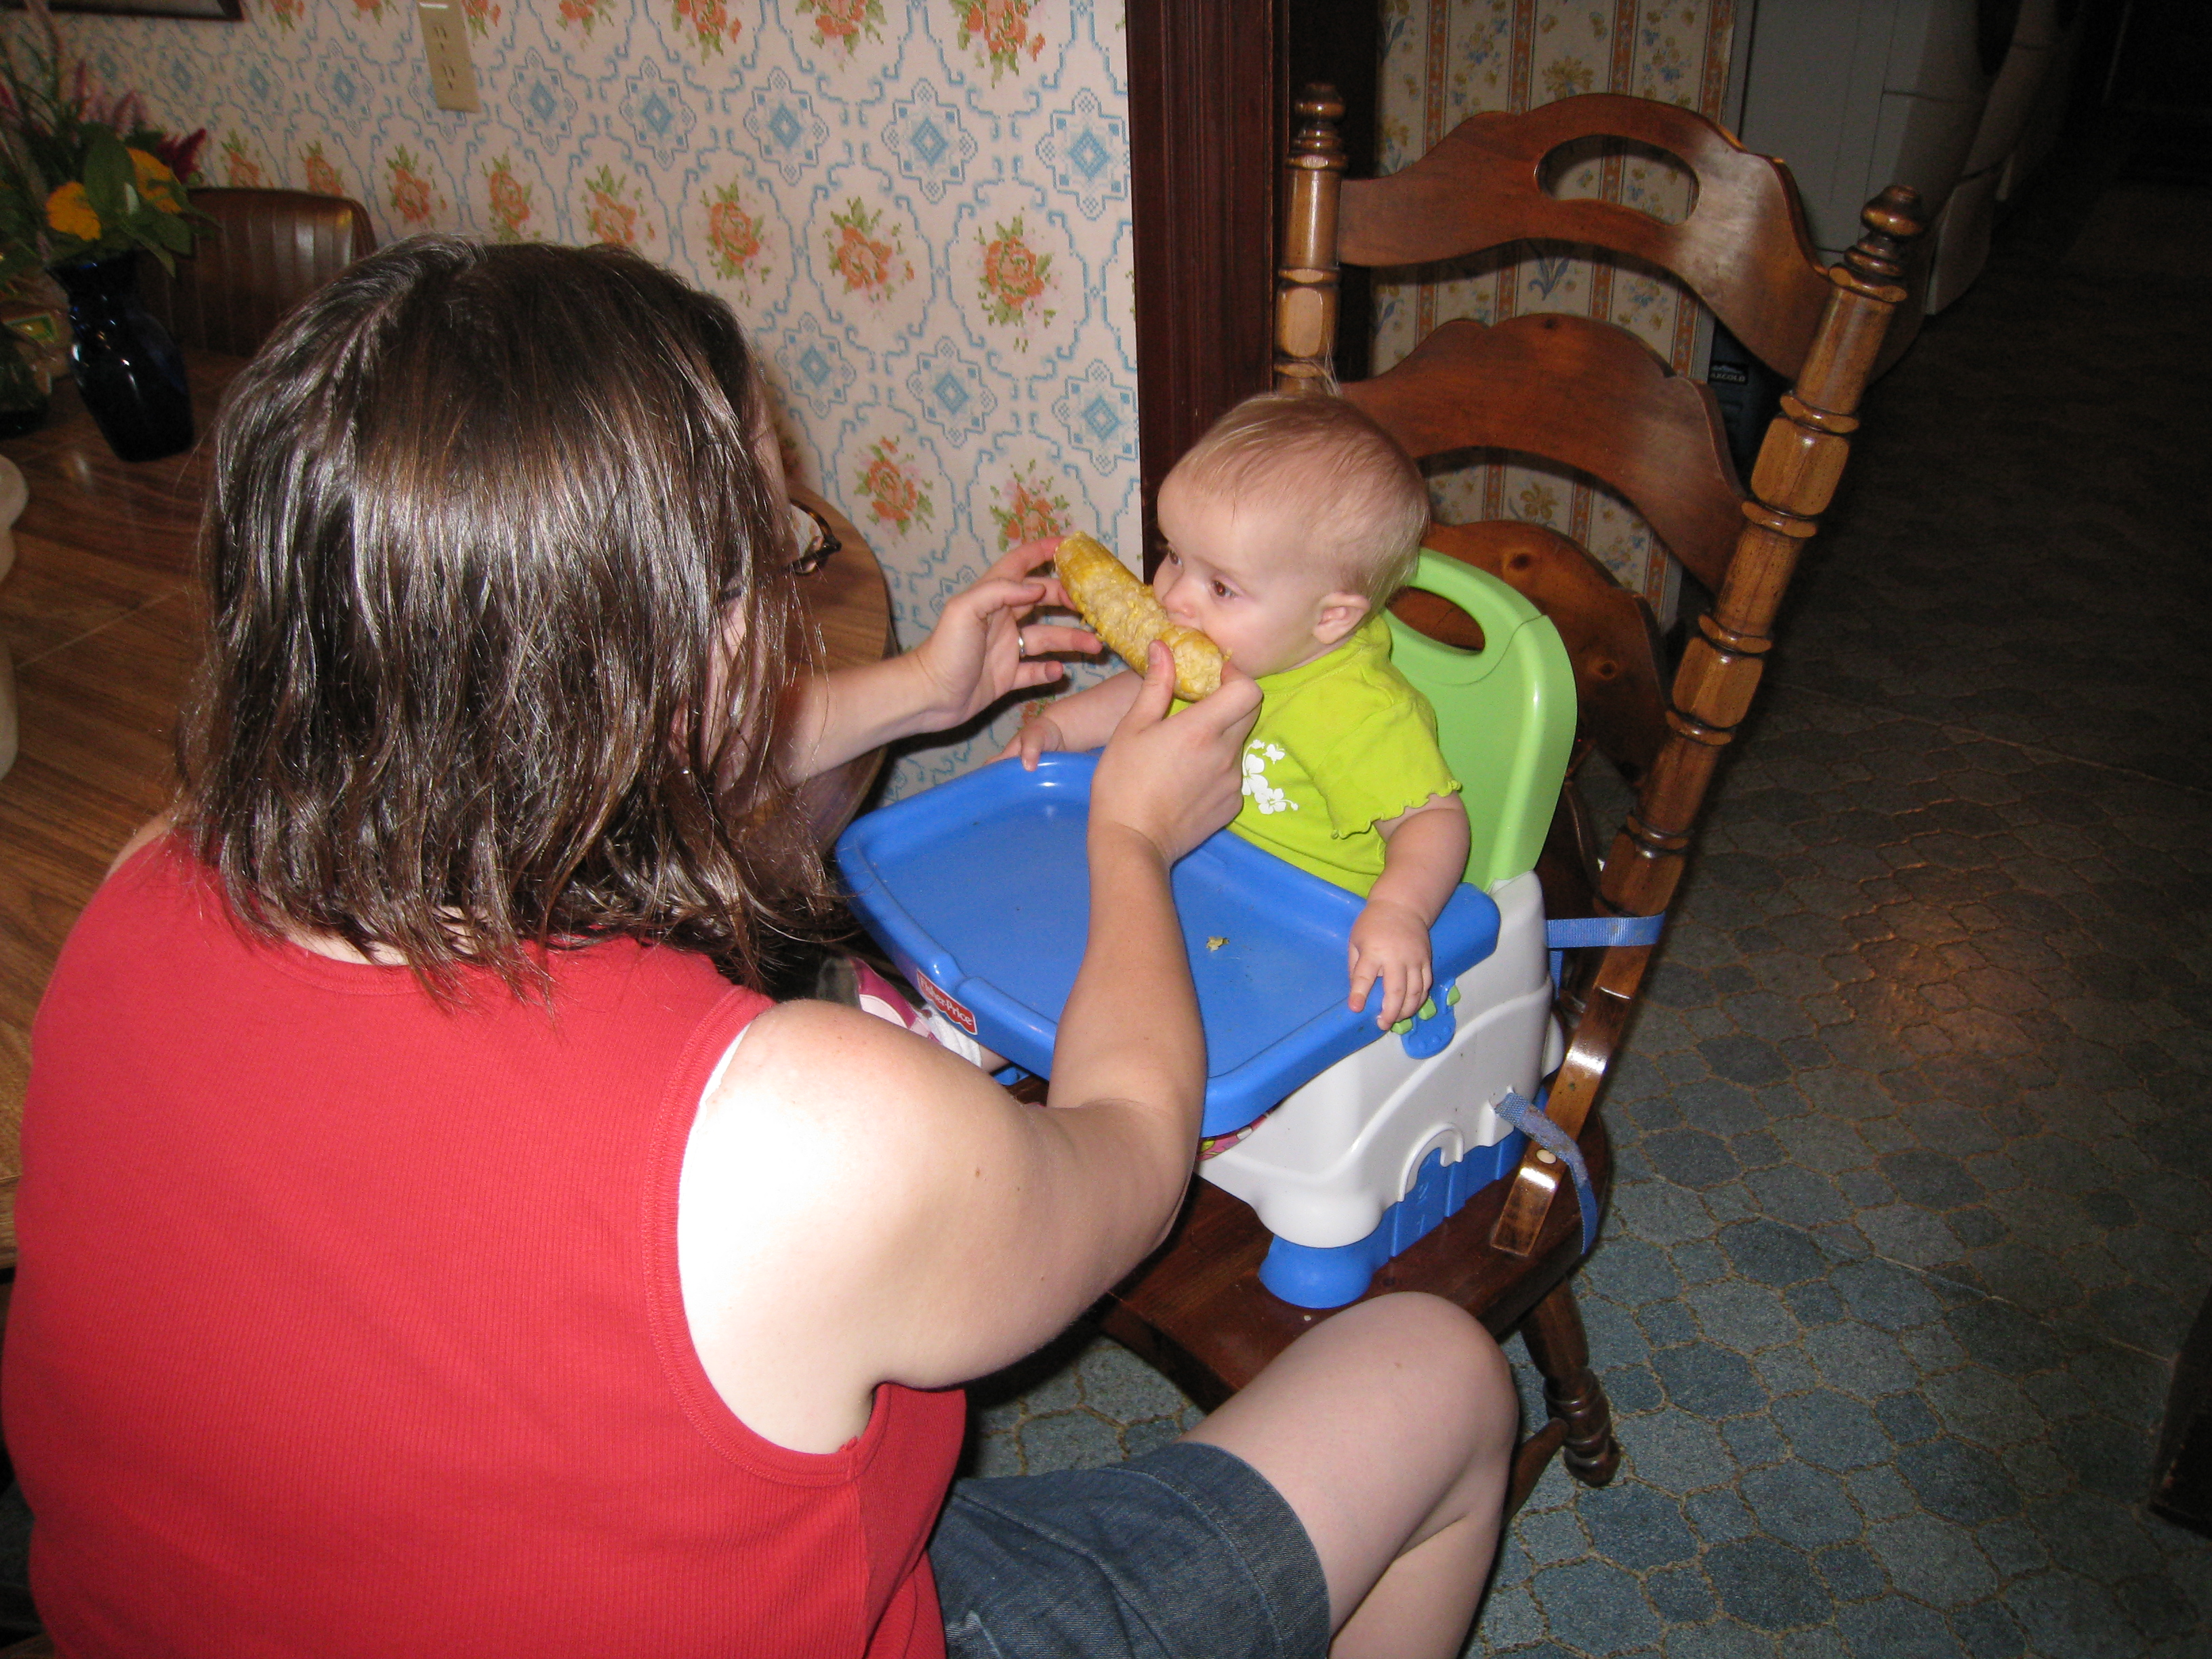 kivrin eating the corn